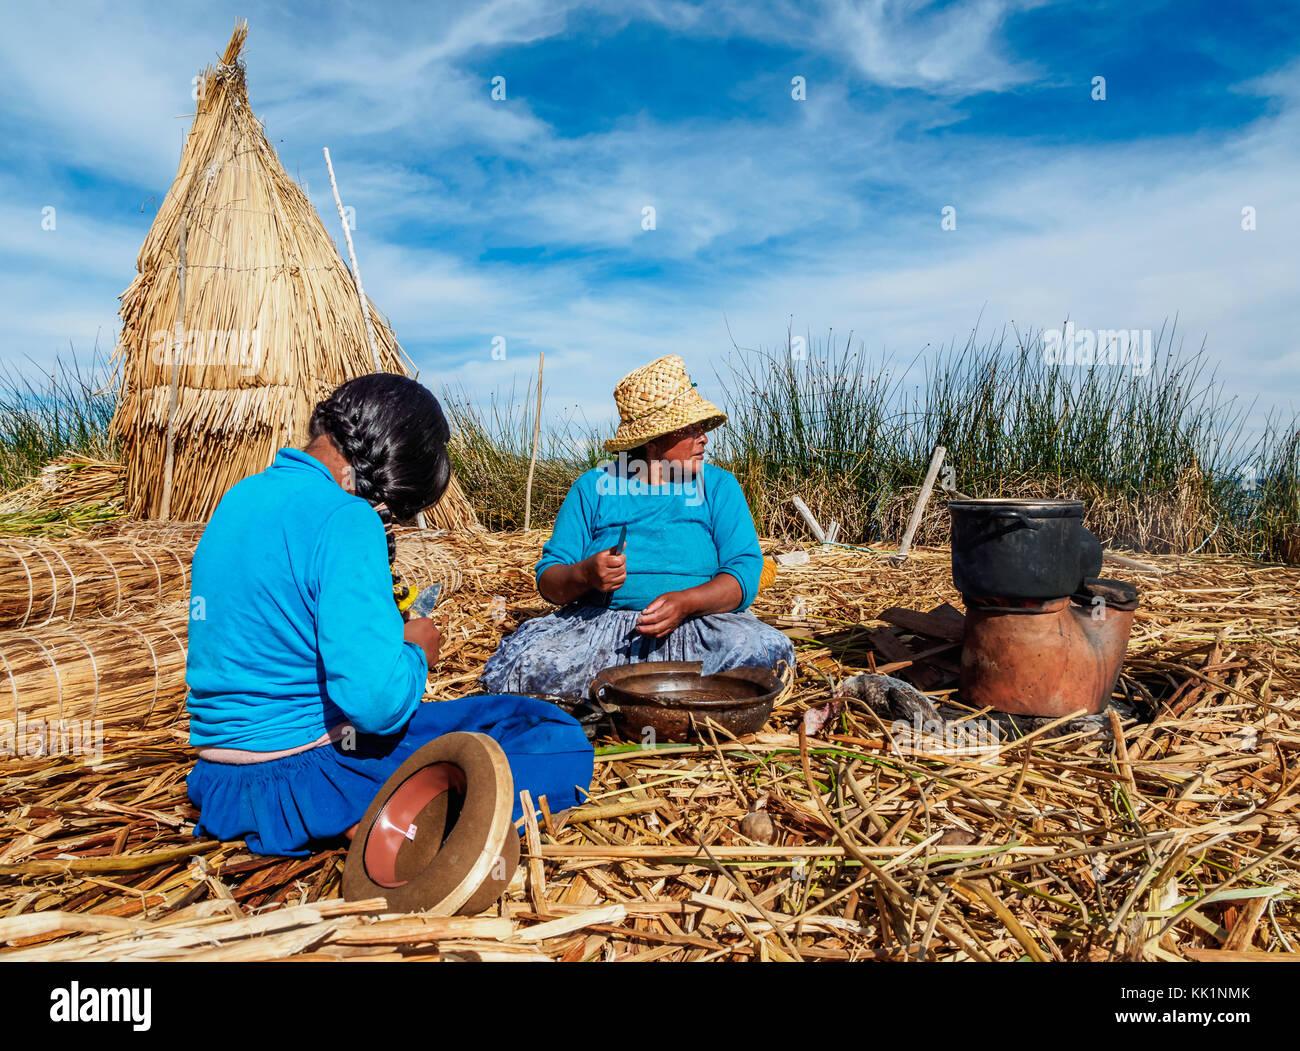 Native Uro Family, Uros Floating Islands, Lake Titicaca, Puno Region, Peru - Stock Image